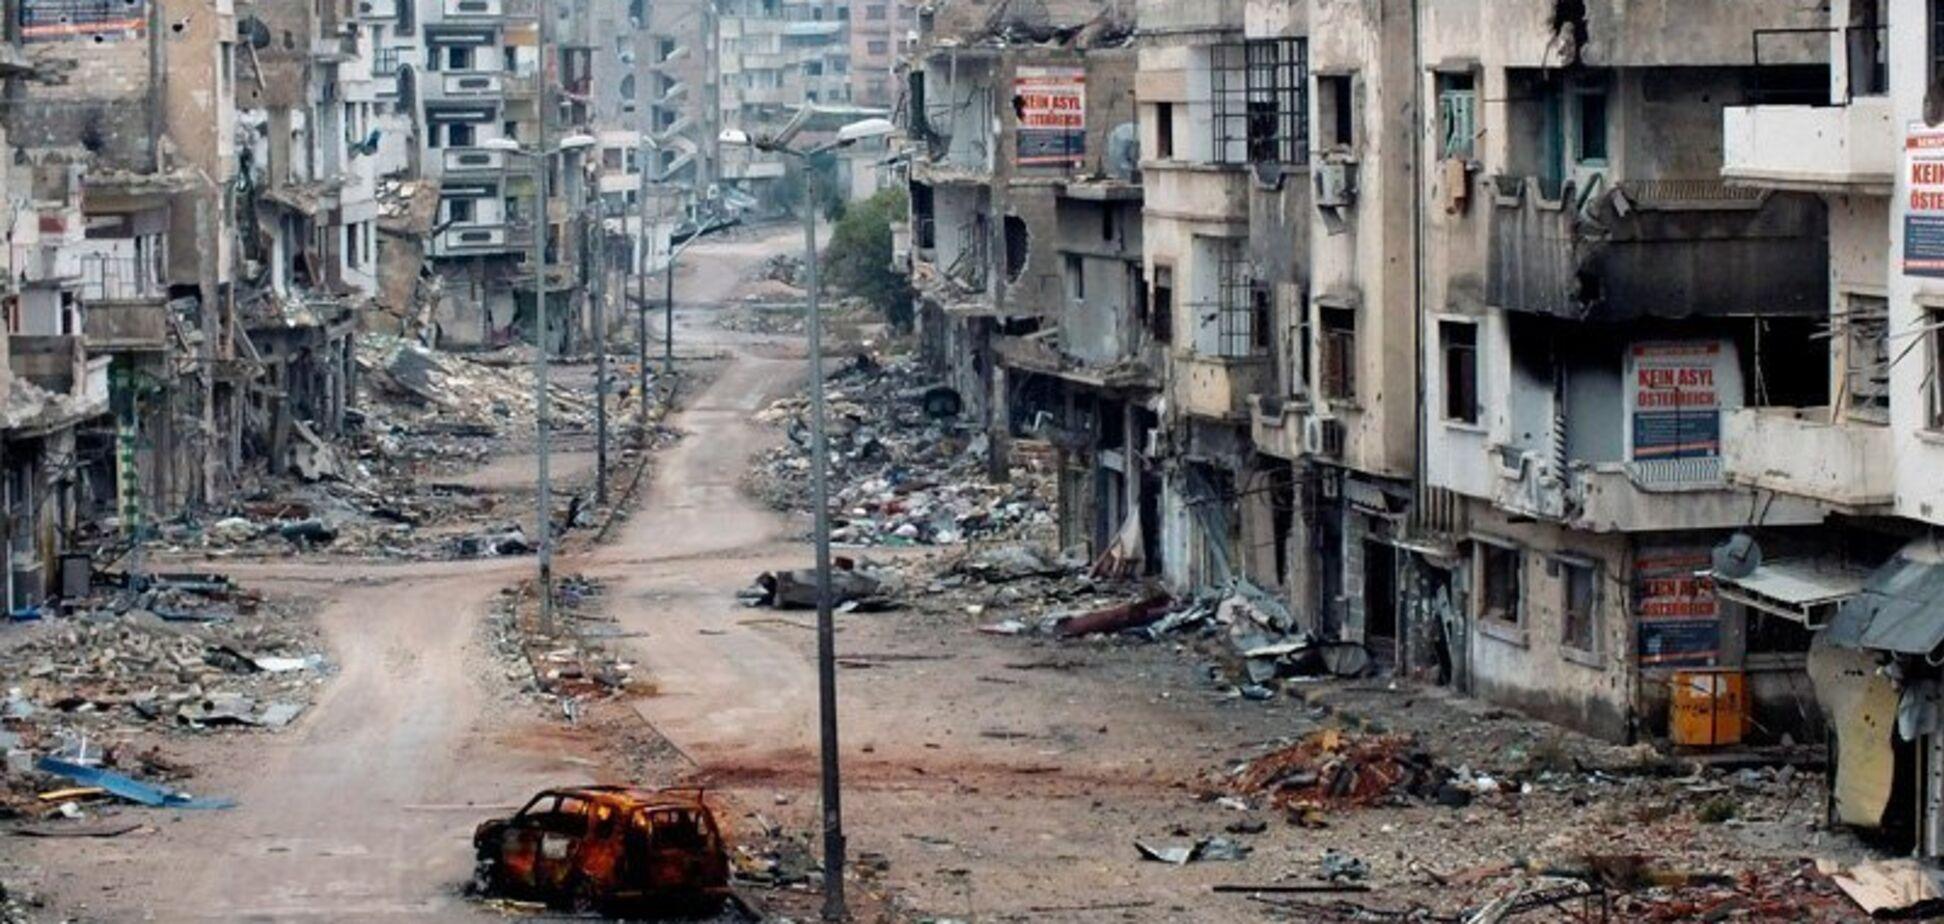 Москва у разбитого корыта в Сирии